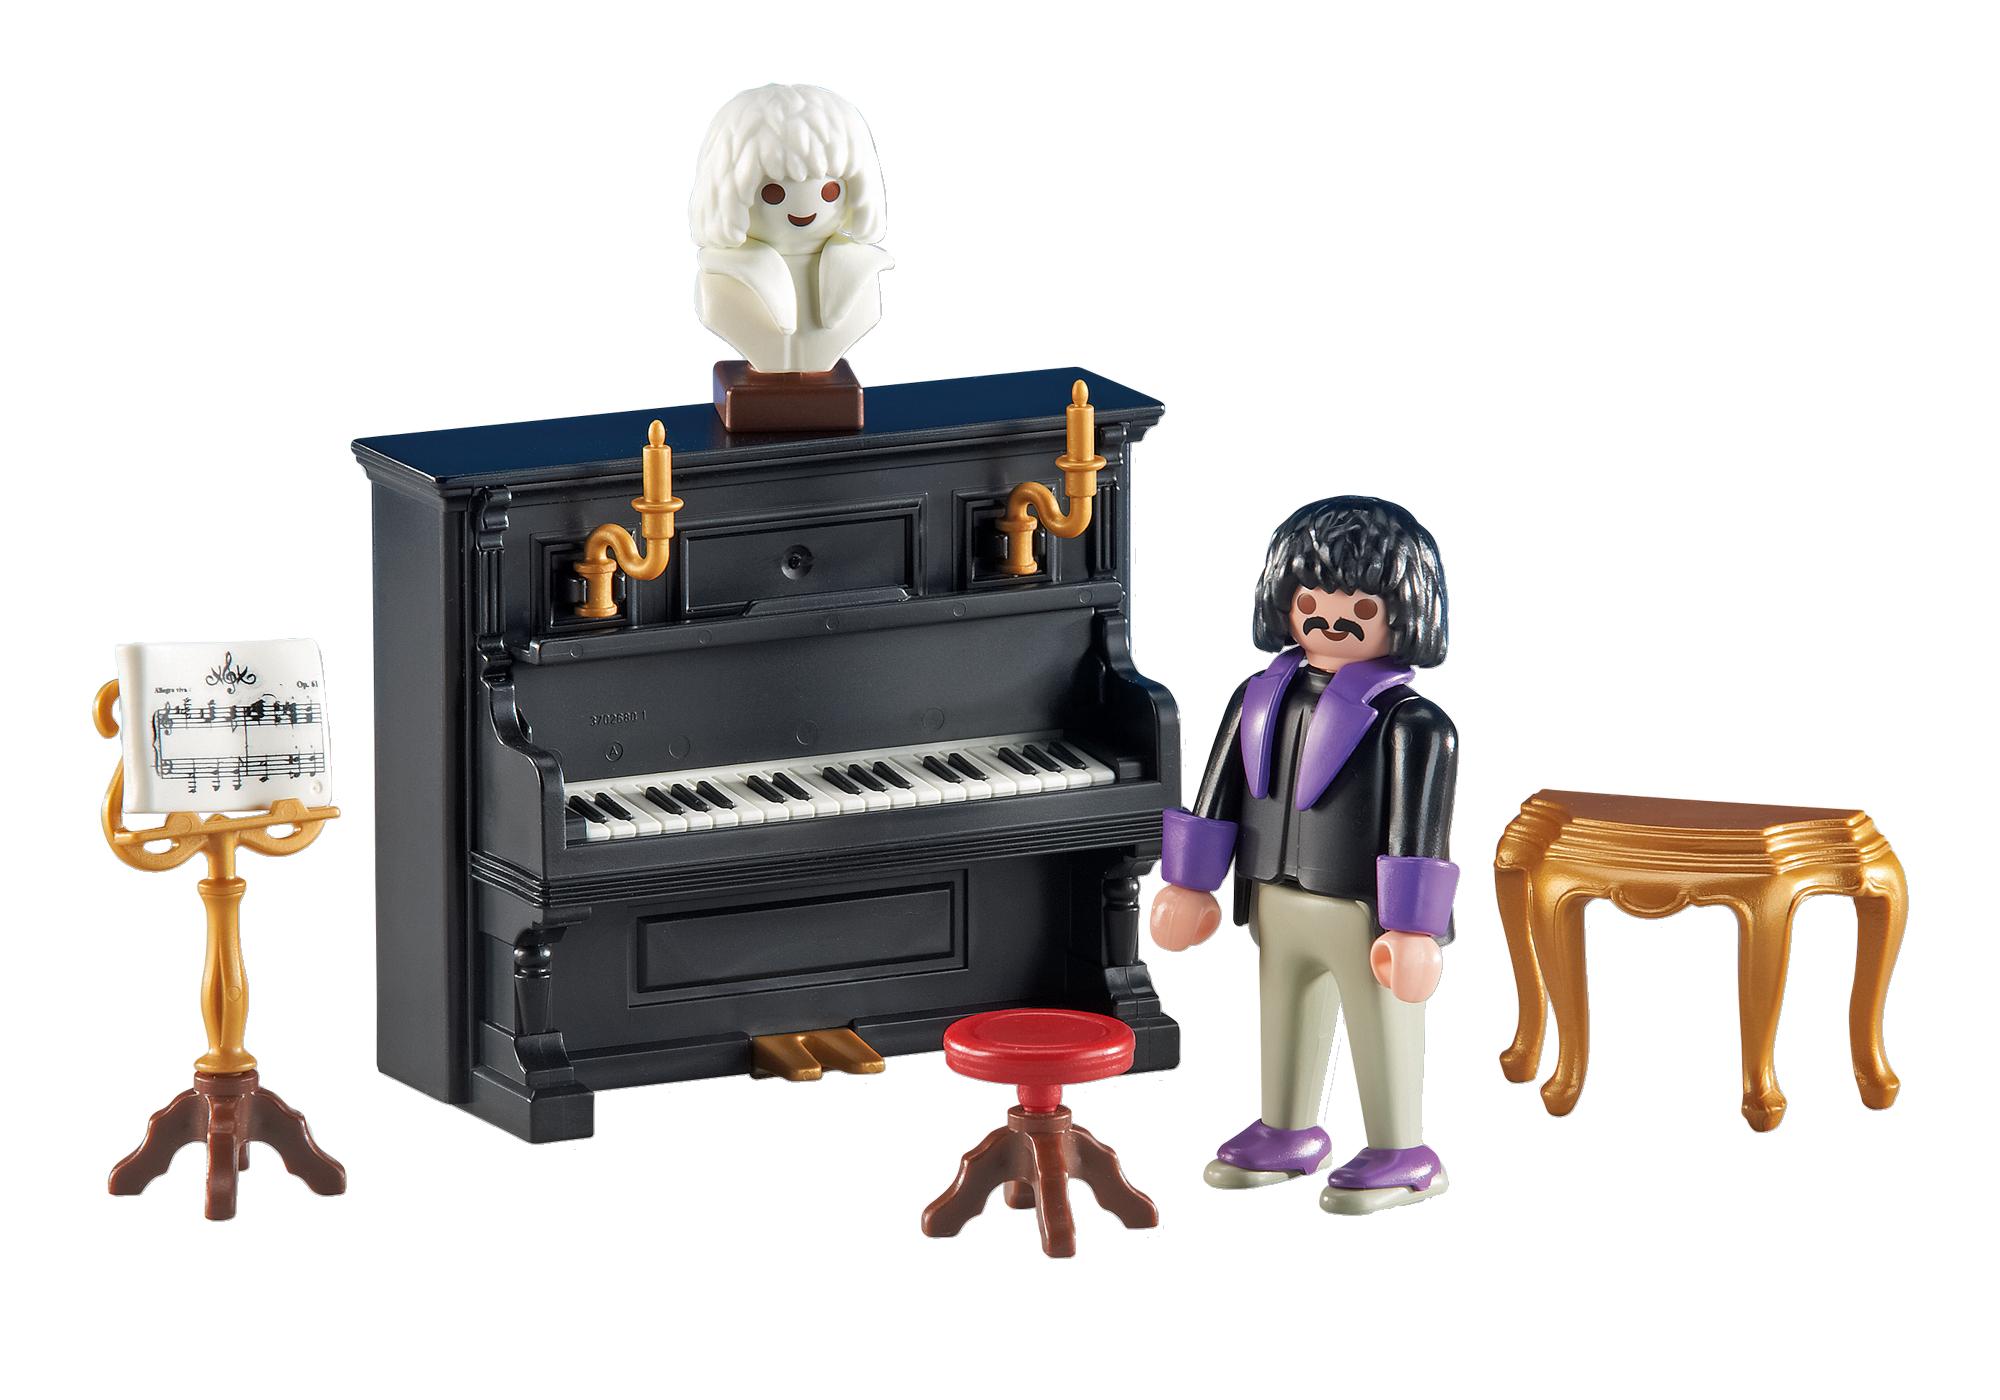 http://media.playmobil.com/i/playmobil/6527_product_detail/Pianista con Piano